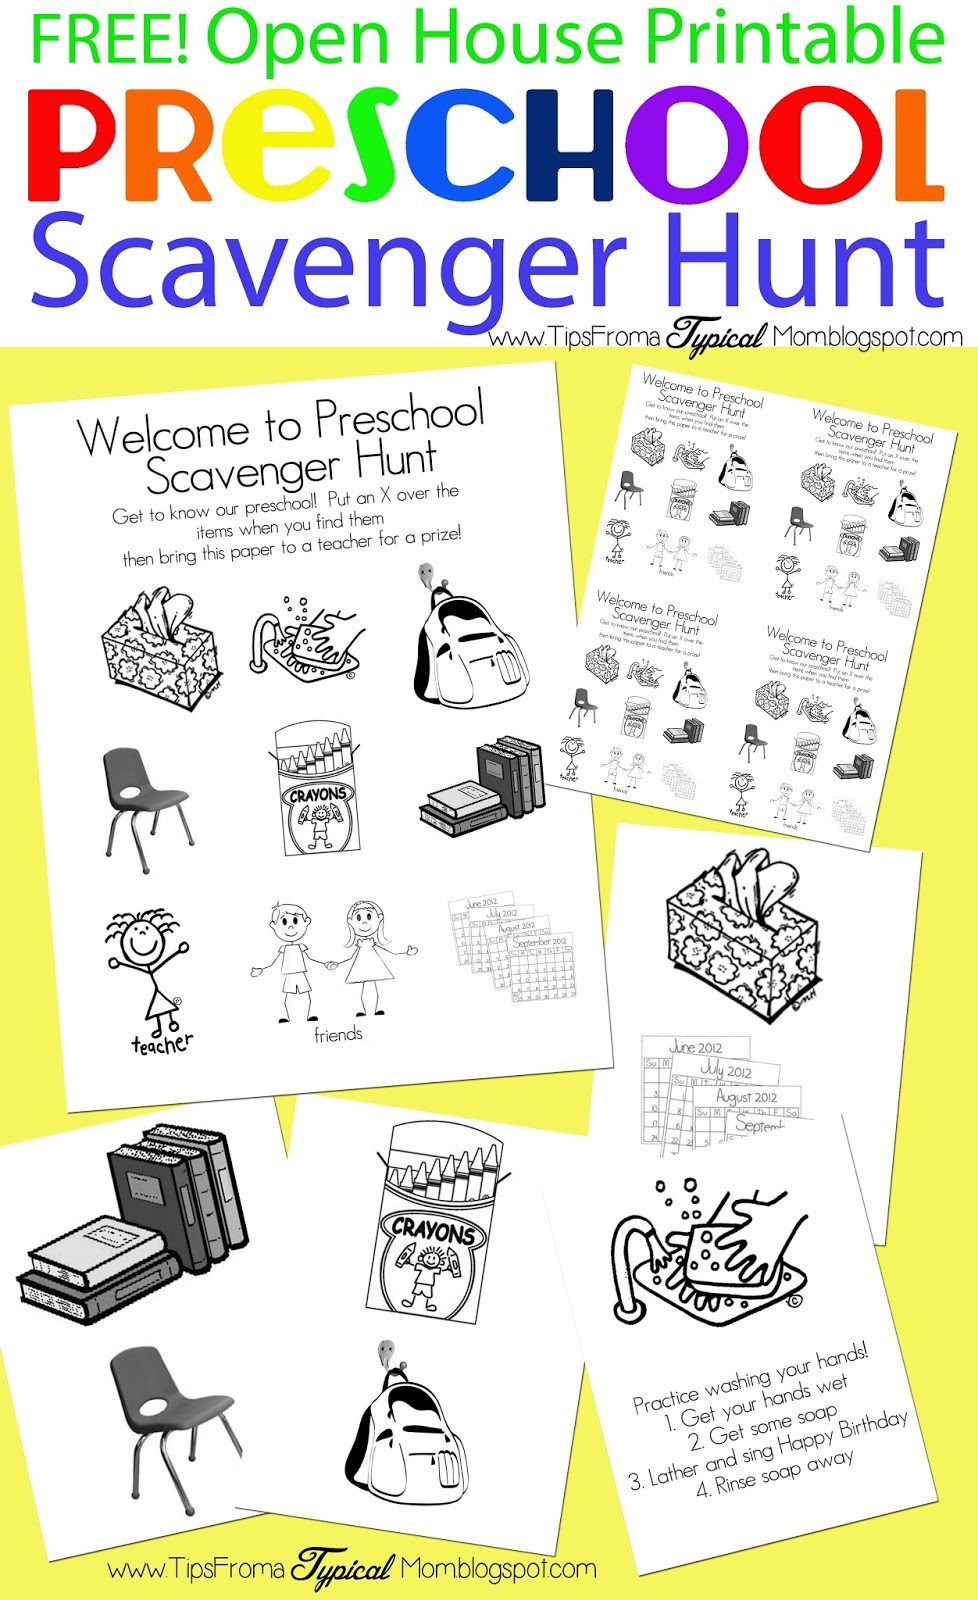 Preschool Open House Free Printable Scavenger Hunt - Tips From A - Free Printable Scavenger Hunt